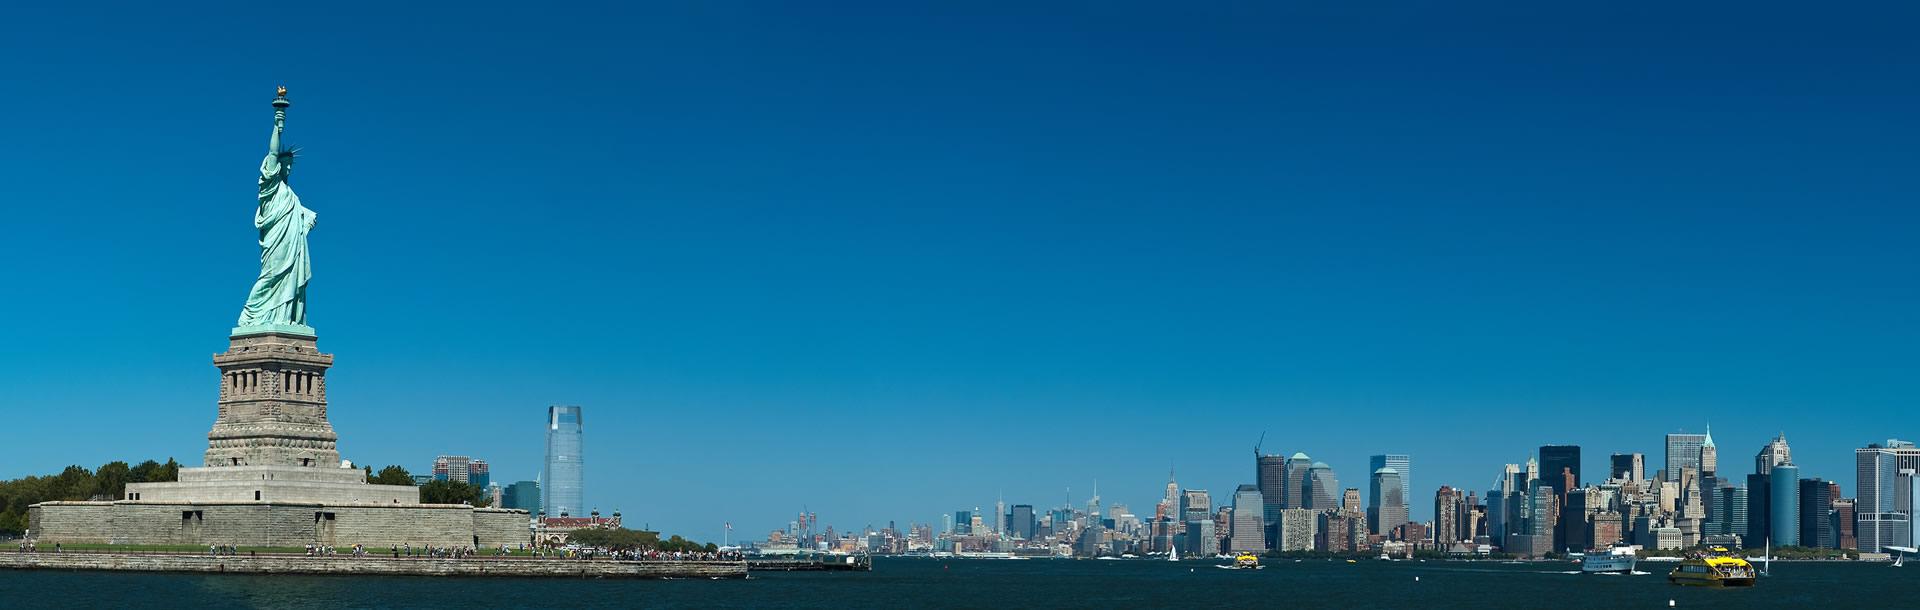 Statue of Liberty and Manhattan Skyline, New York USA